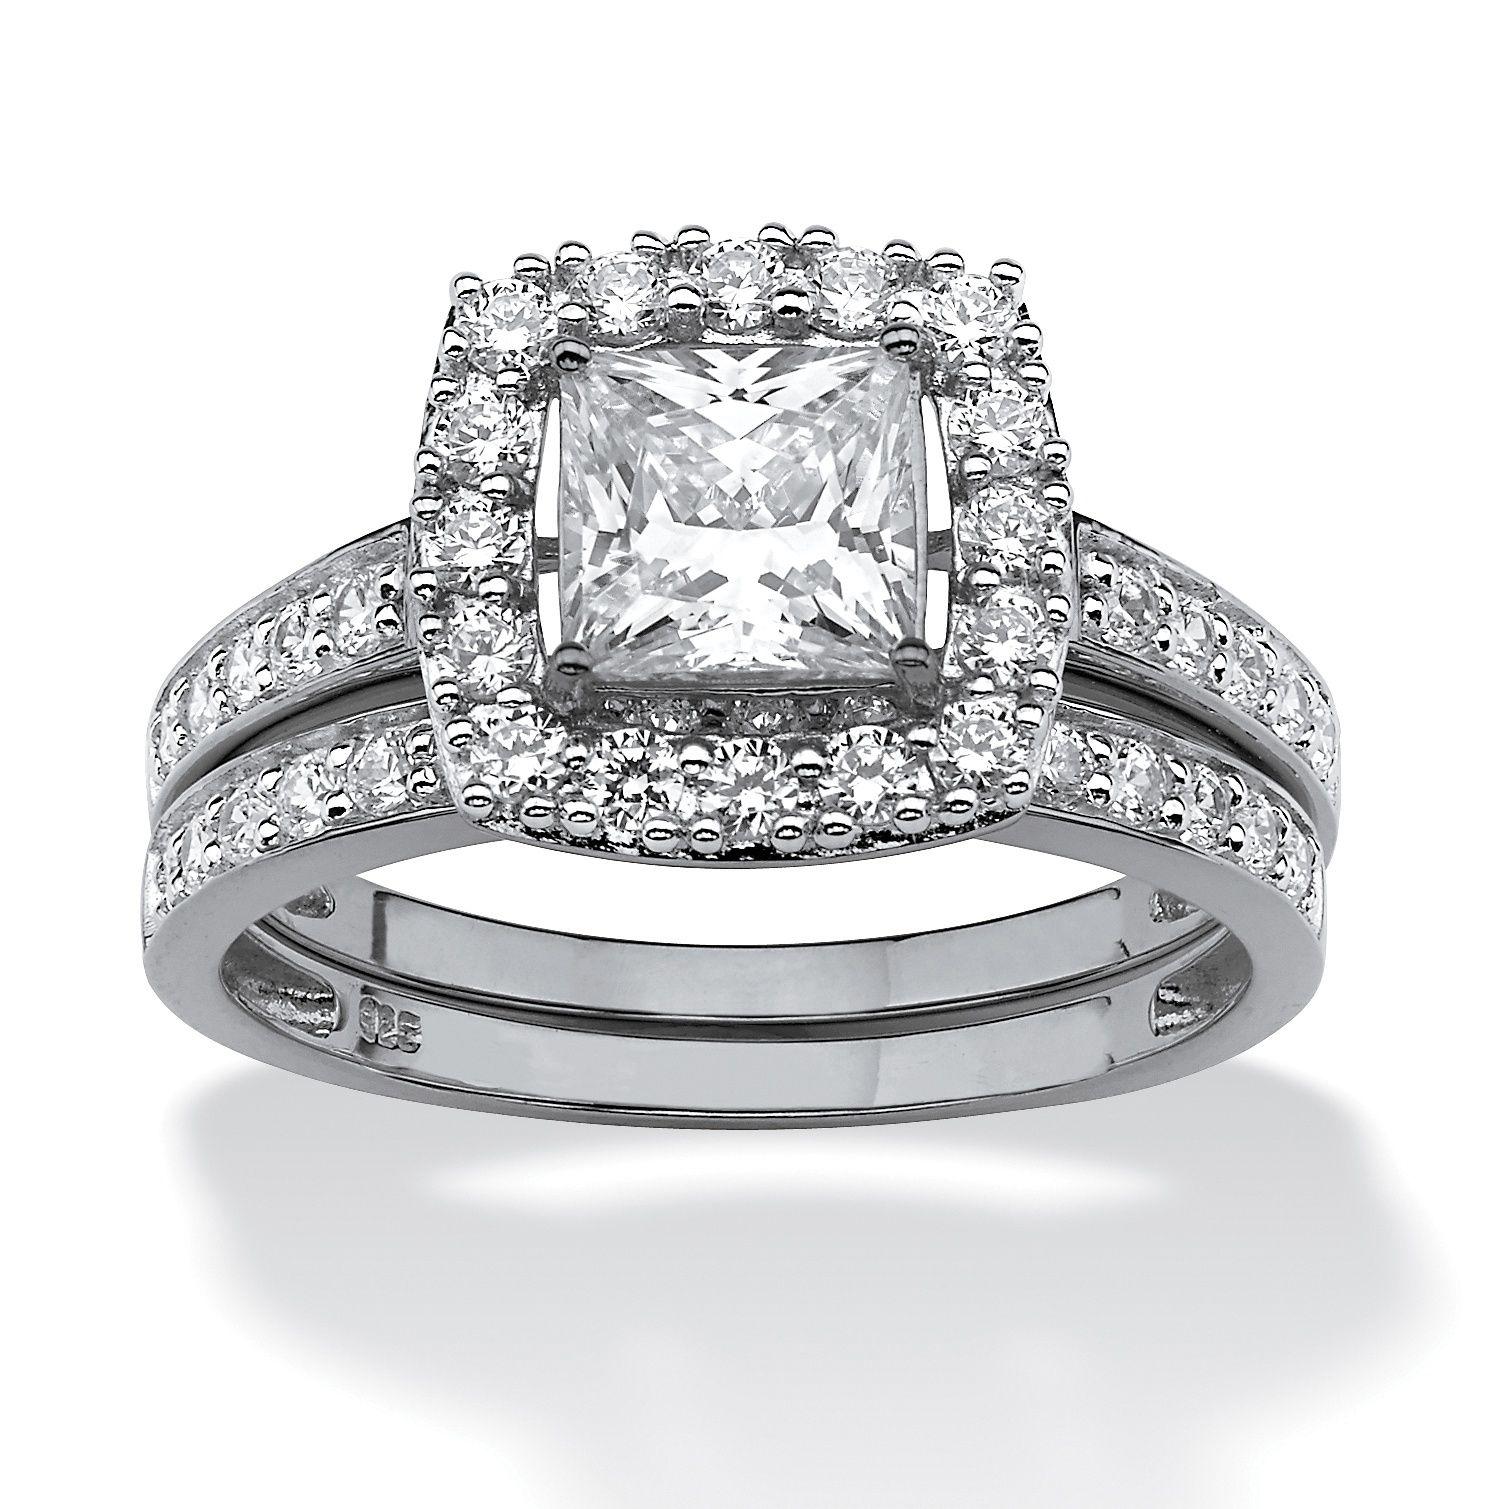 1.93 TCW PrincessCut Cubic Zirconia Bridal Ring Wedding